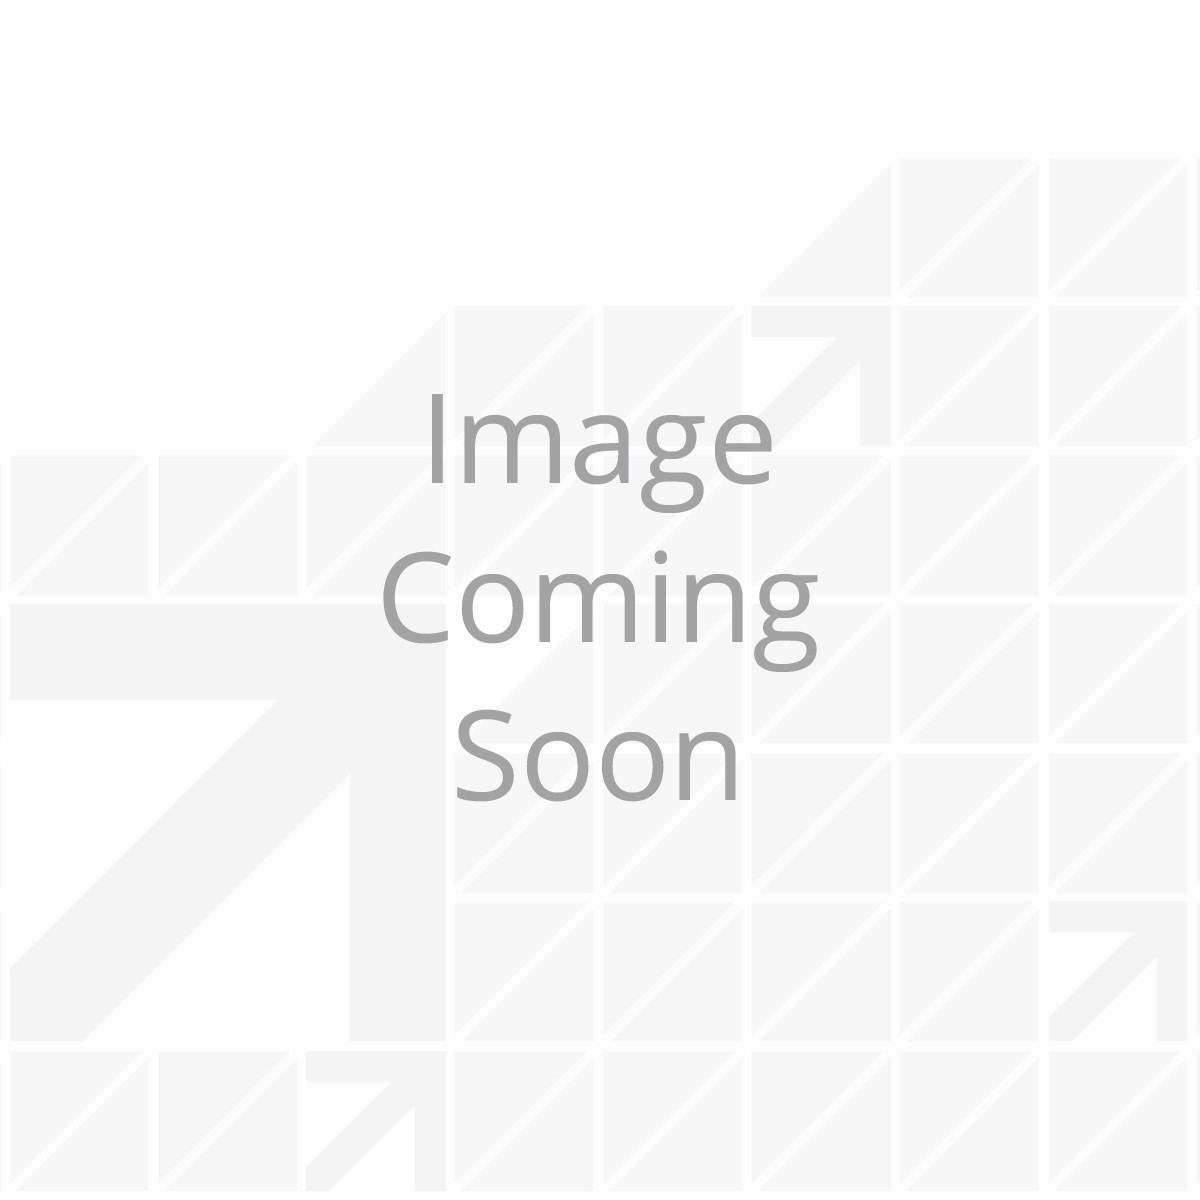 122085_Hex-Nut_001